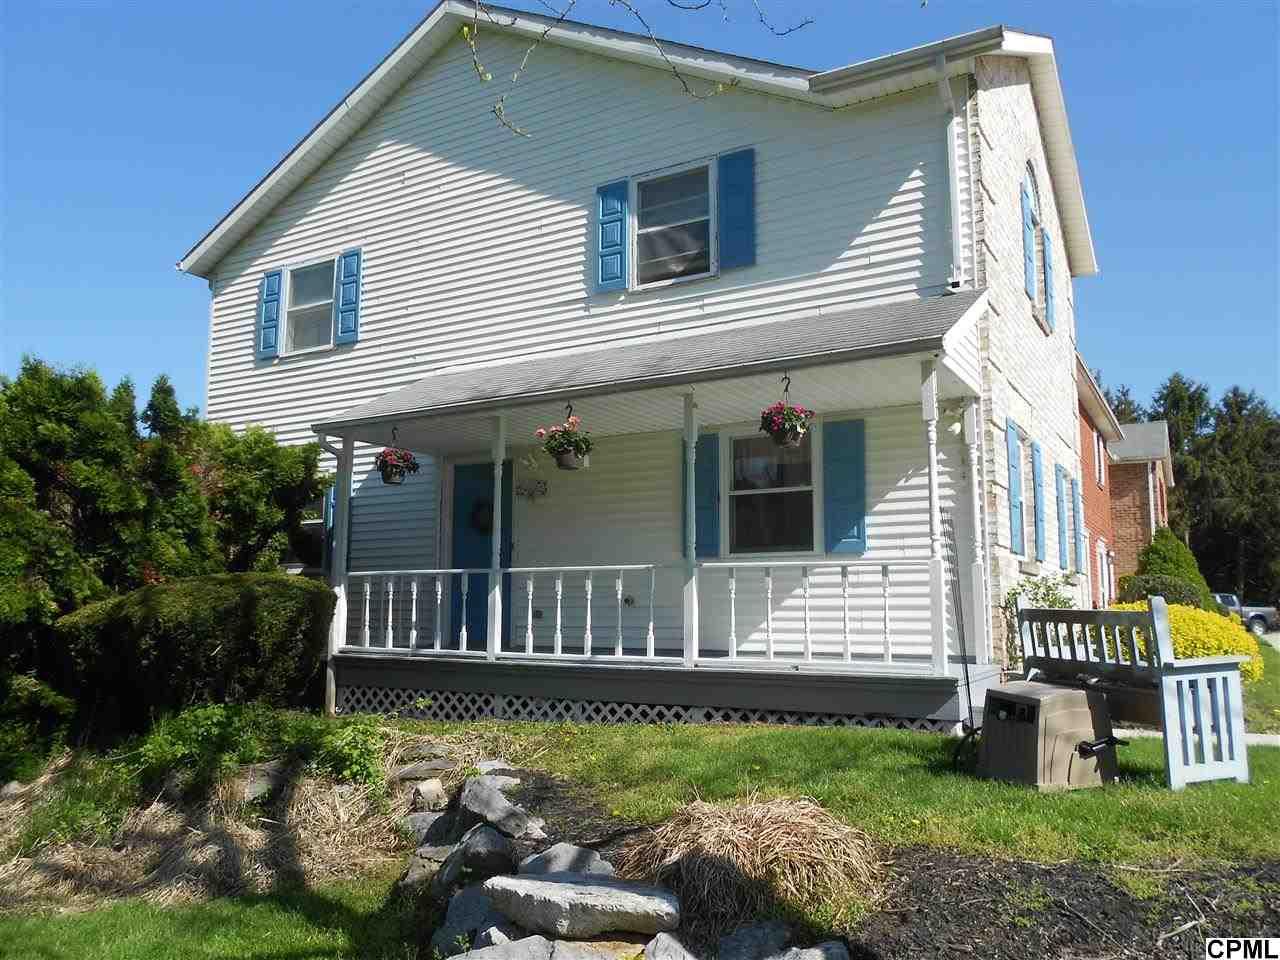 Rental Homes for Rent, ListingId:29850716, location: 1137 Nanroc Mechanicsburg 17055